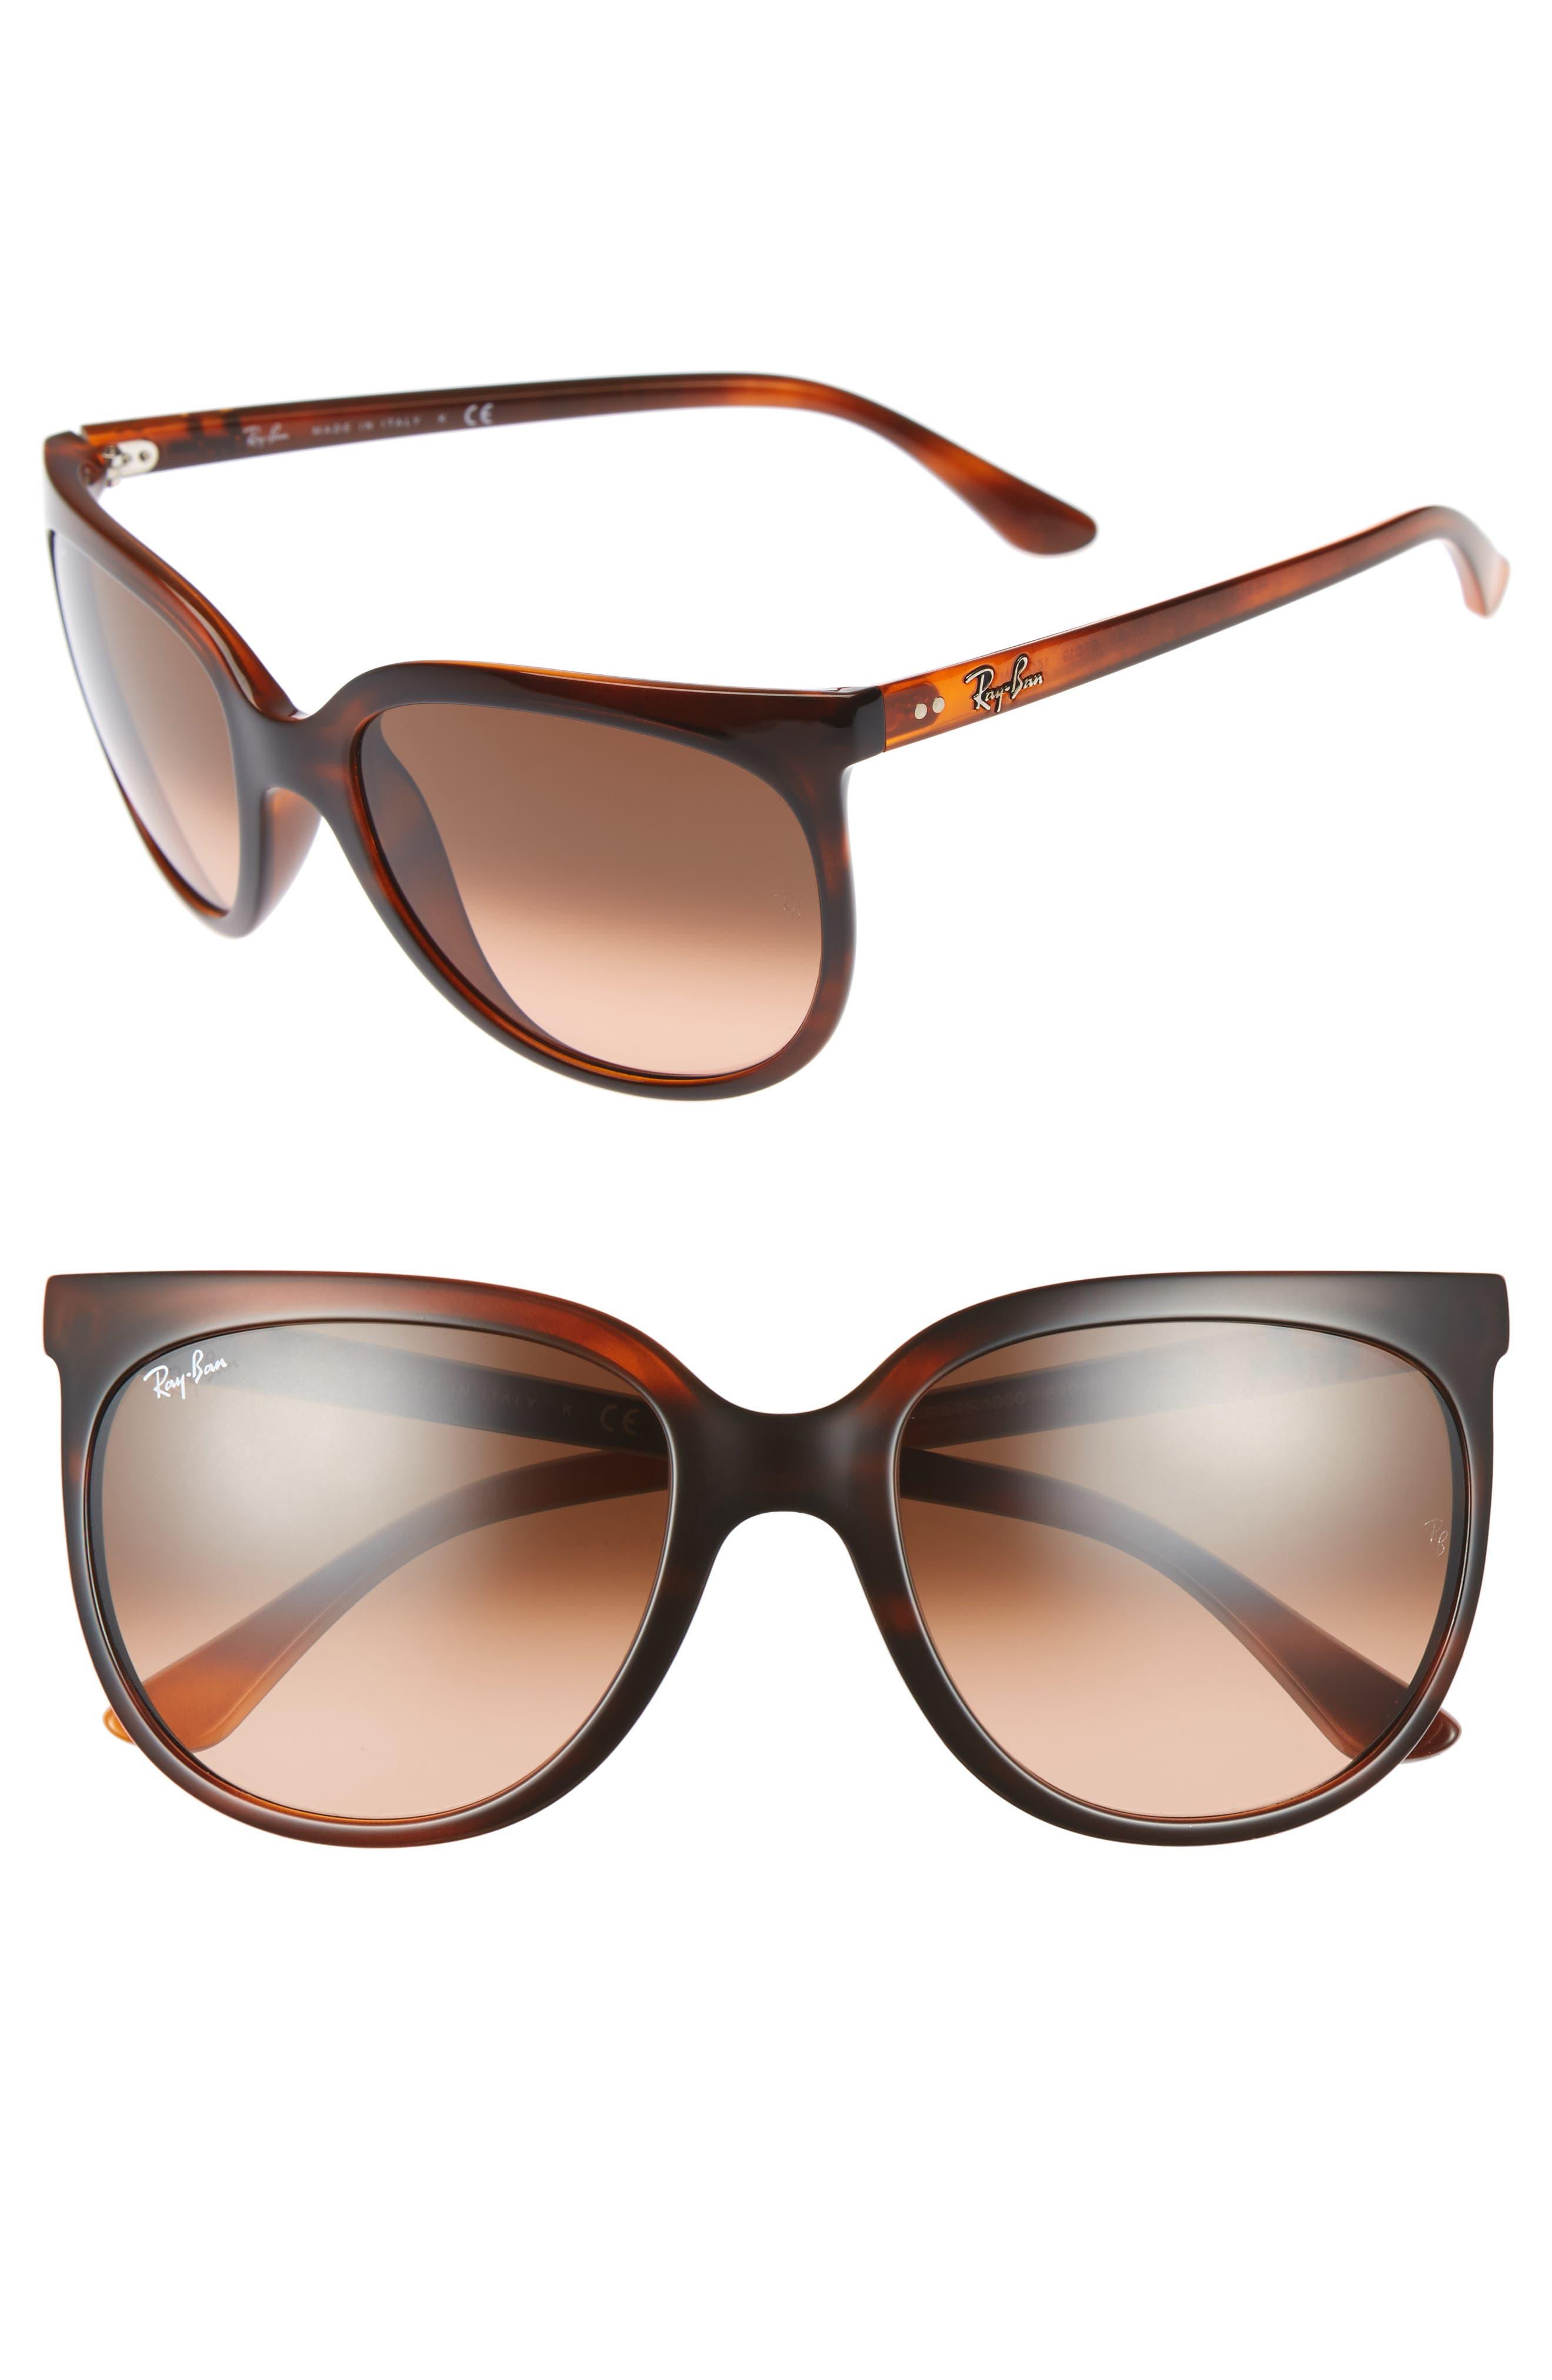 Main Image - Ray-Ban Retro Cat Eye Sunglasses